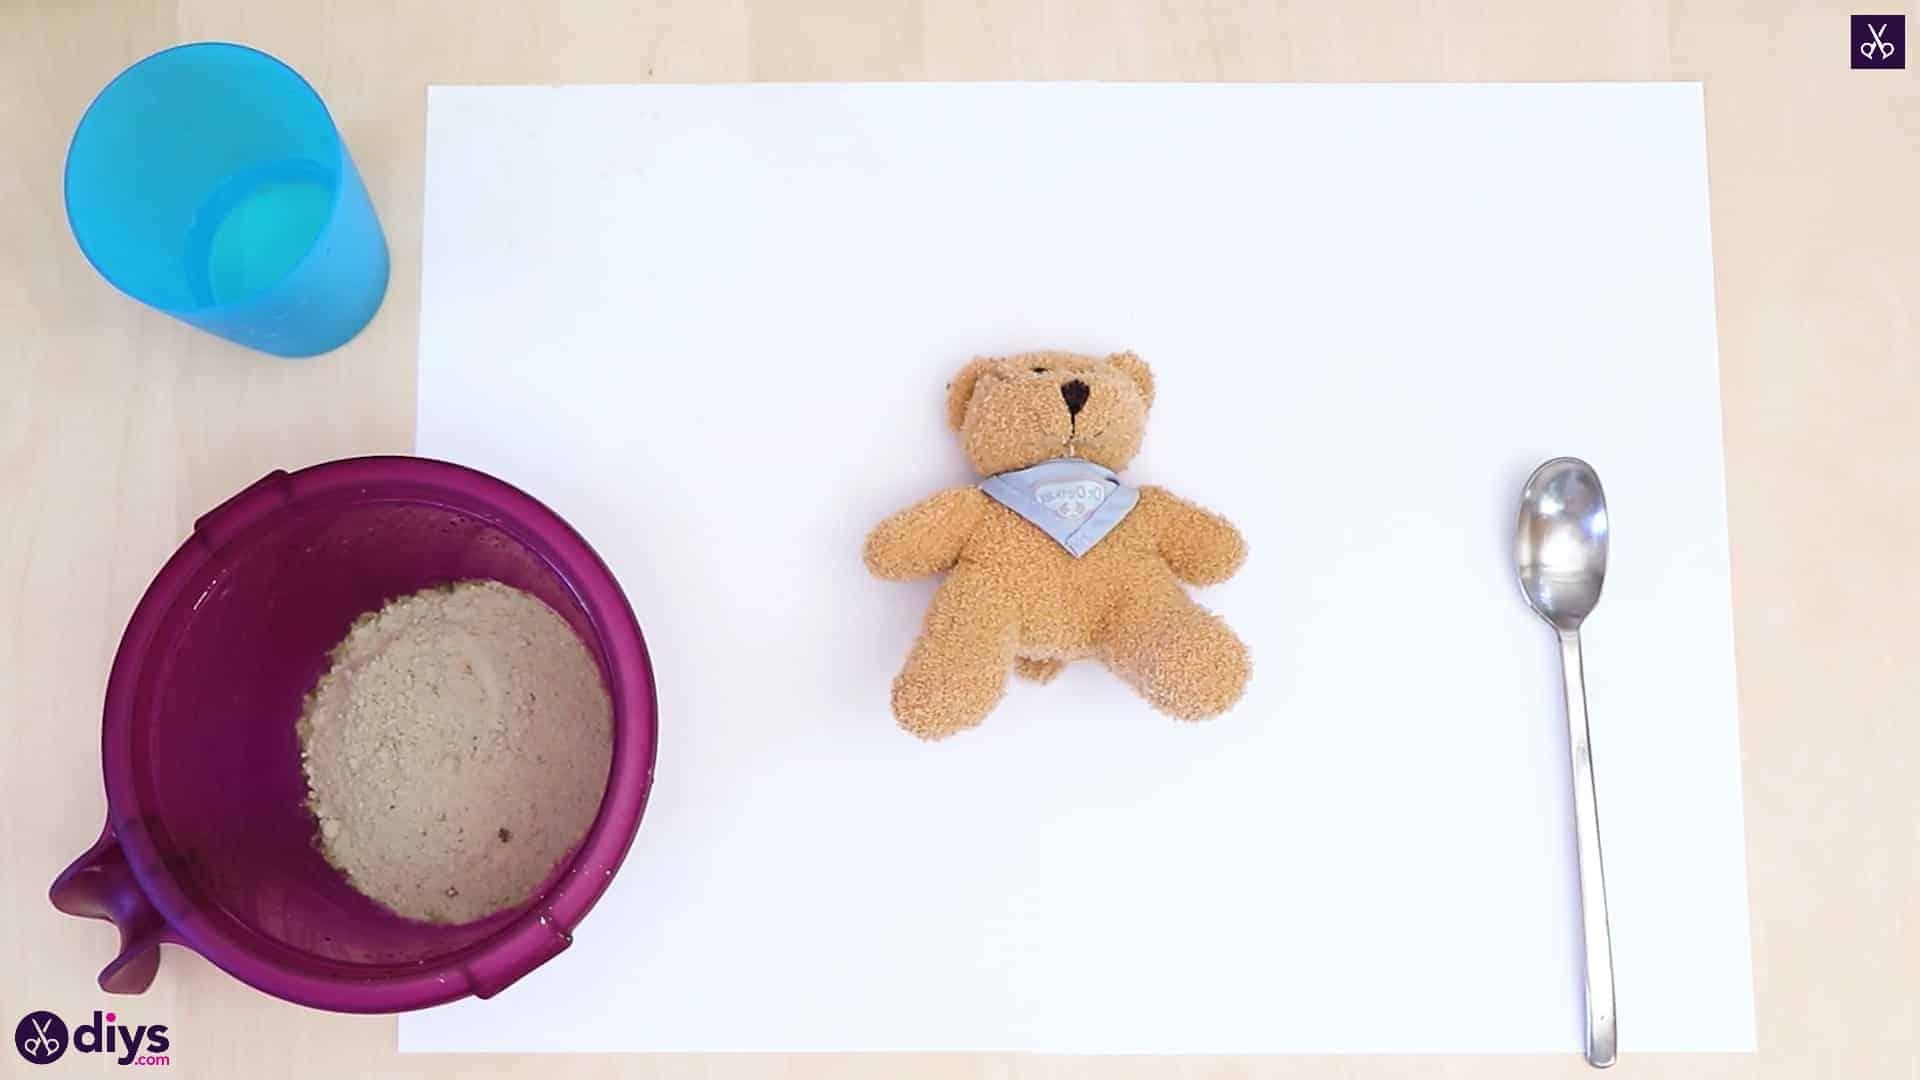 Concrete teddy bear materials